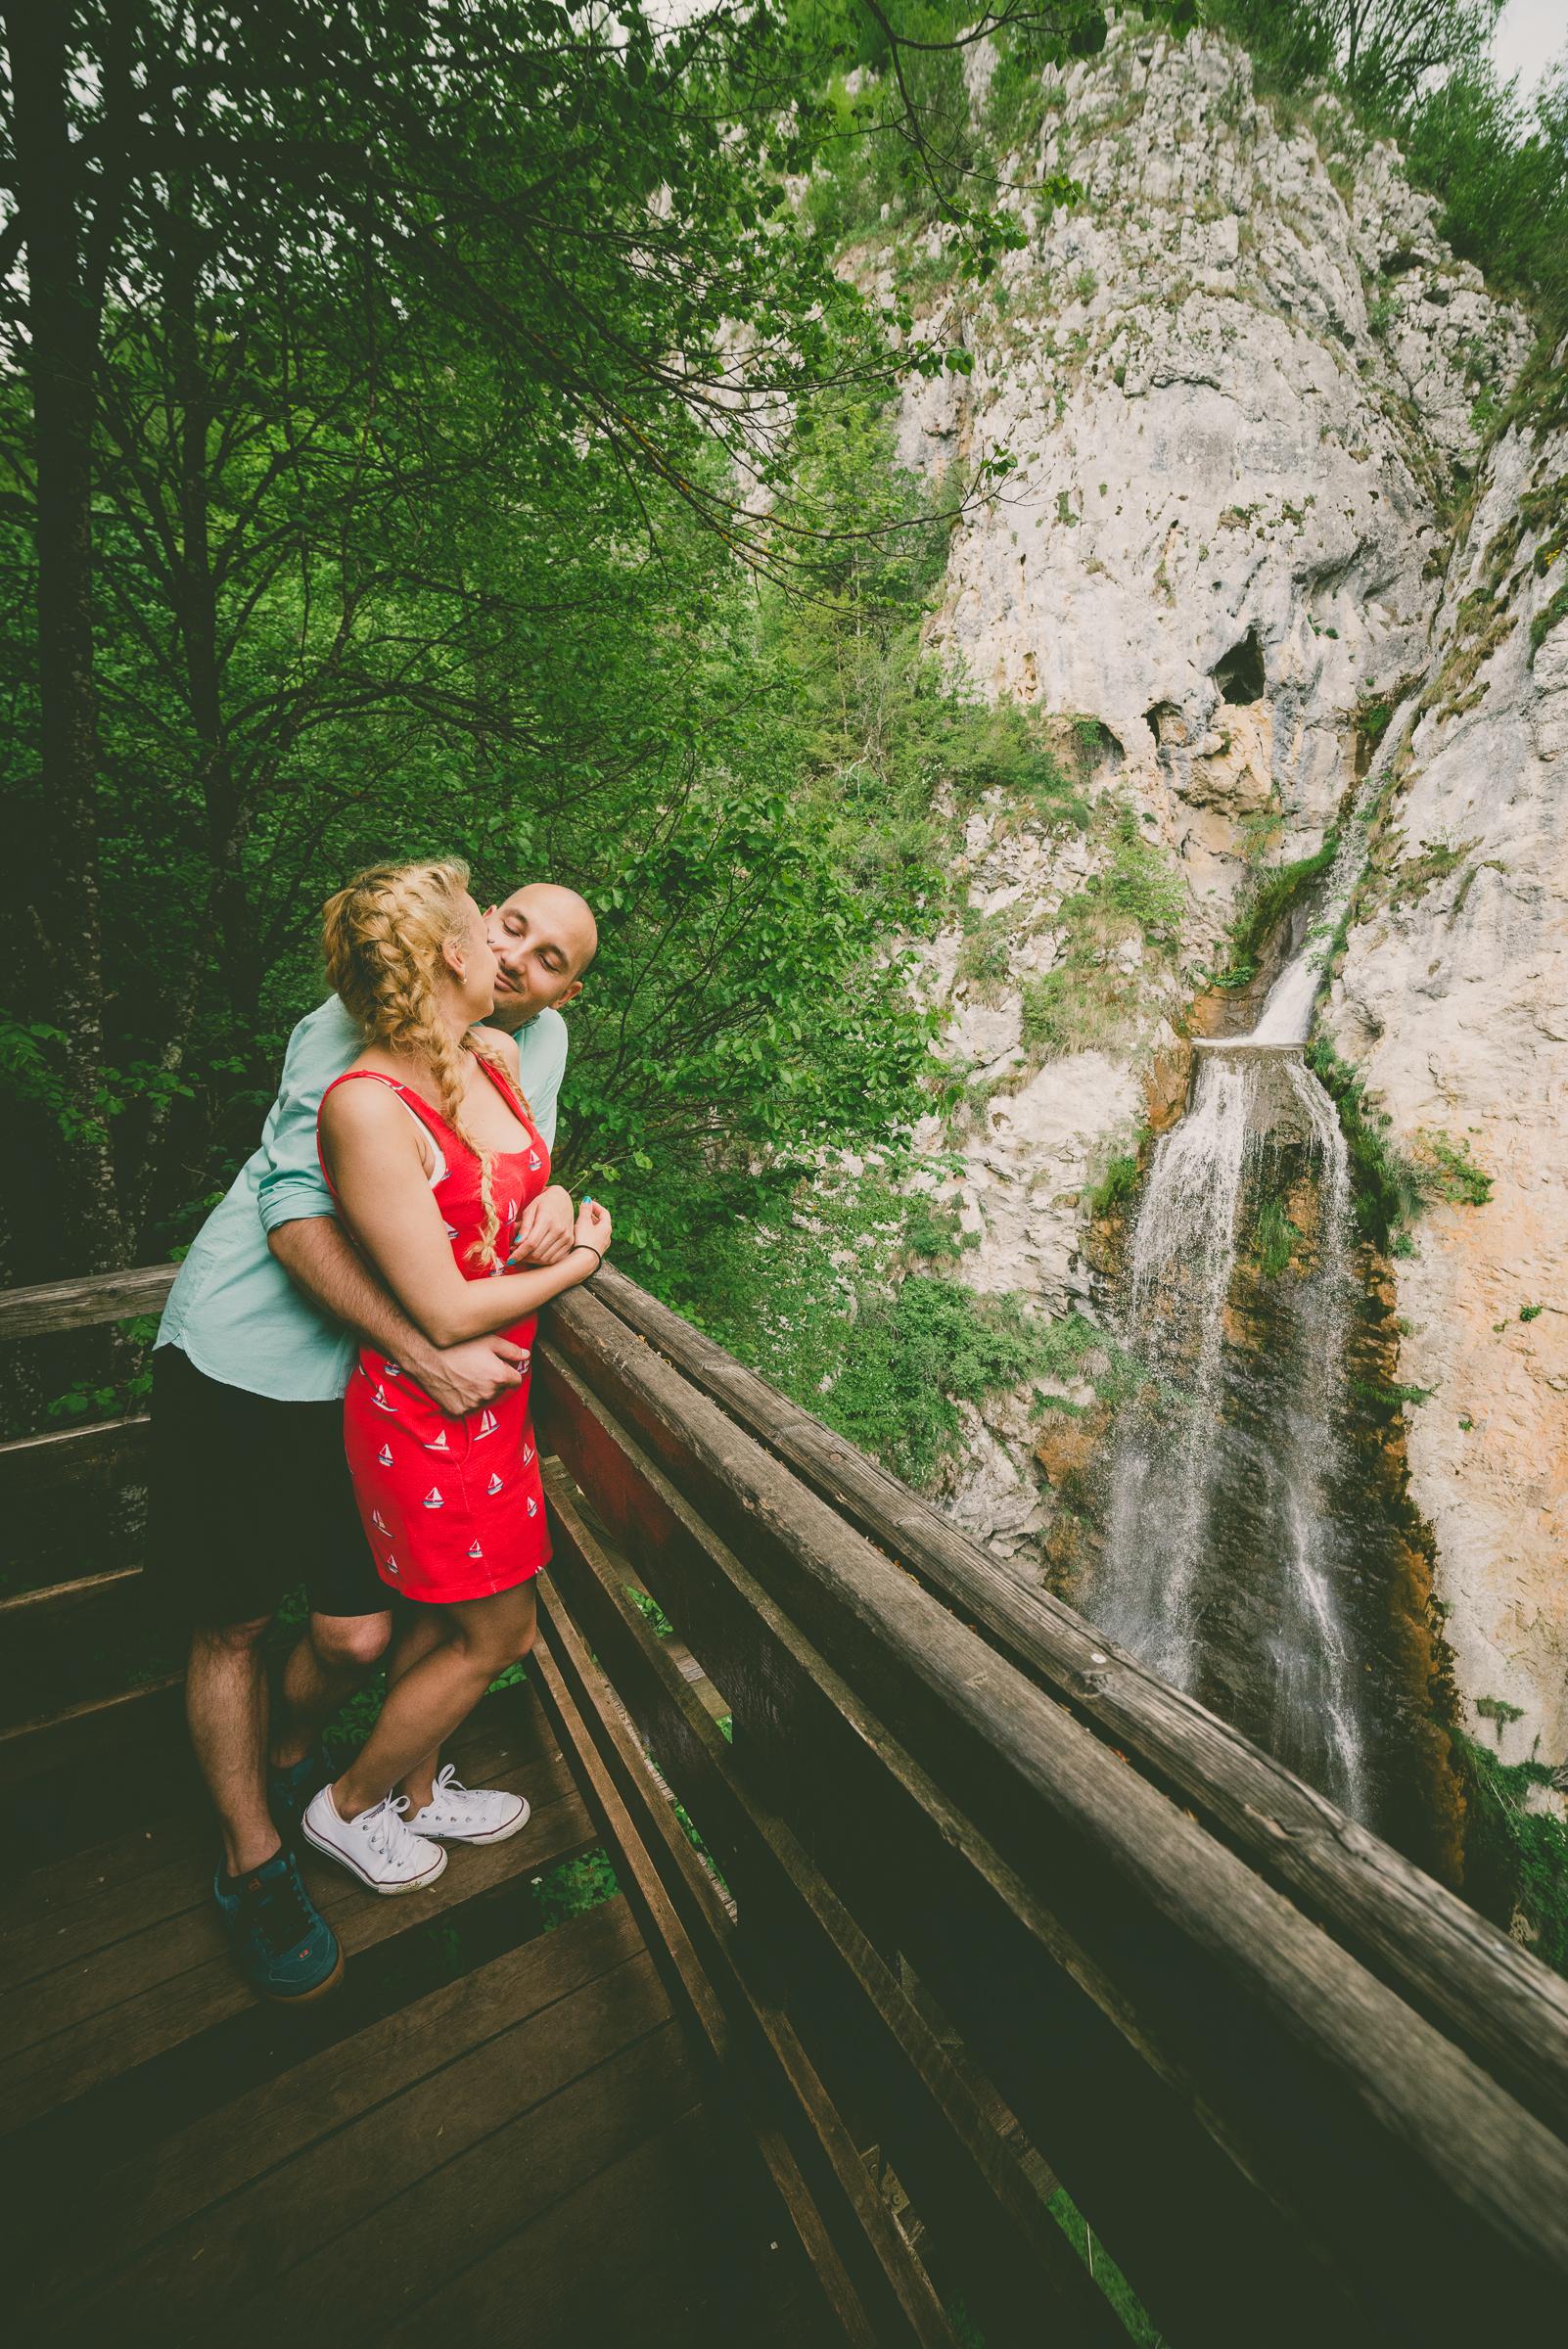 Fotografie de logodna in aer liber